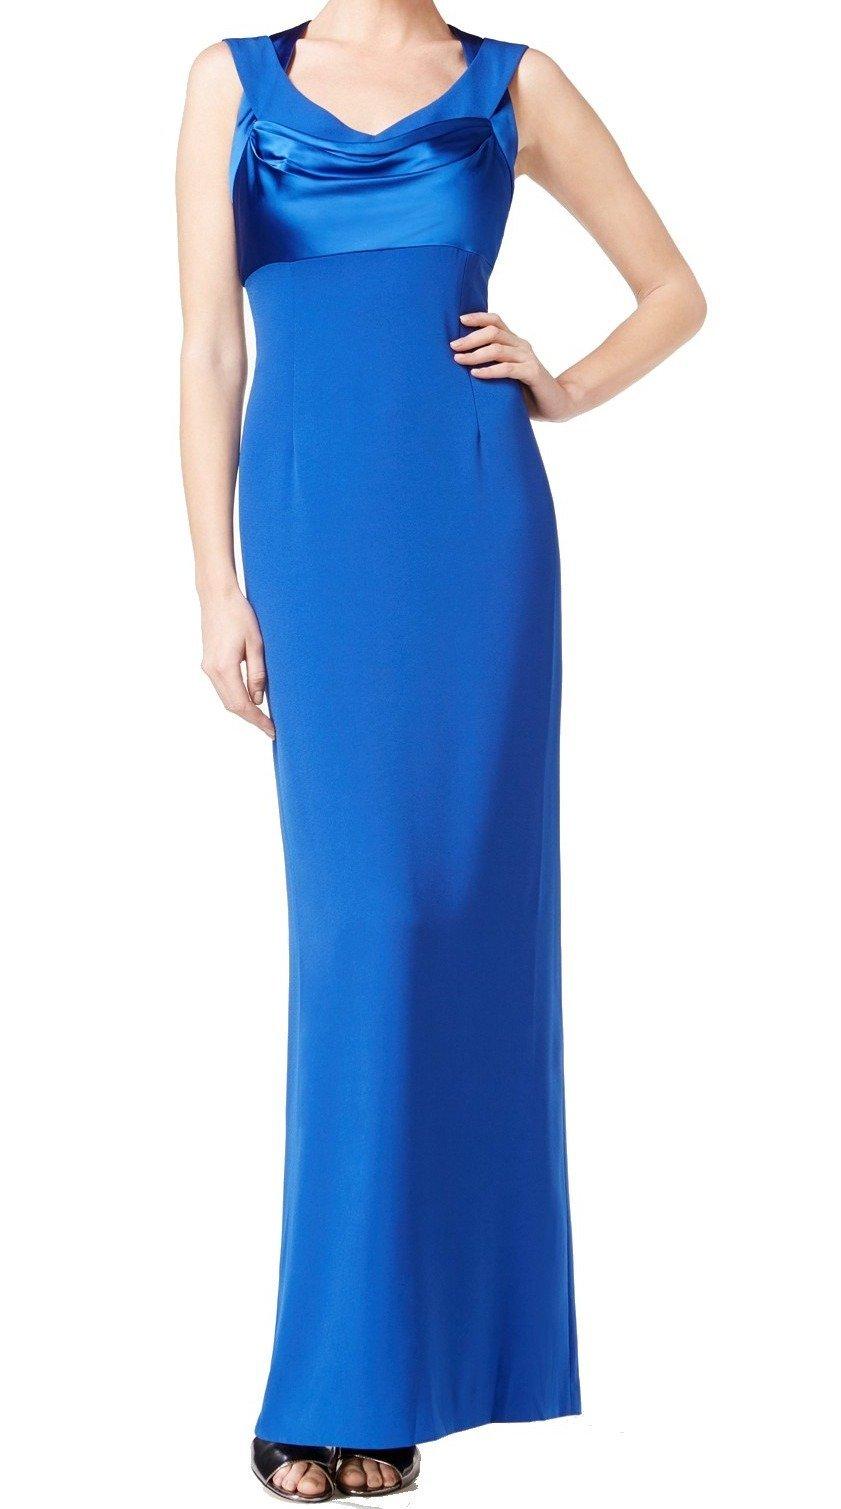 Available at Amazon: Calvin Klein Women's Satin Crepe Crisscross Column Gown (14 Byzantine) Blue